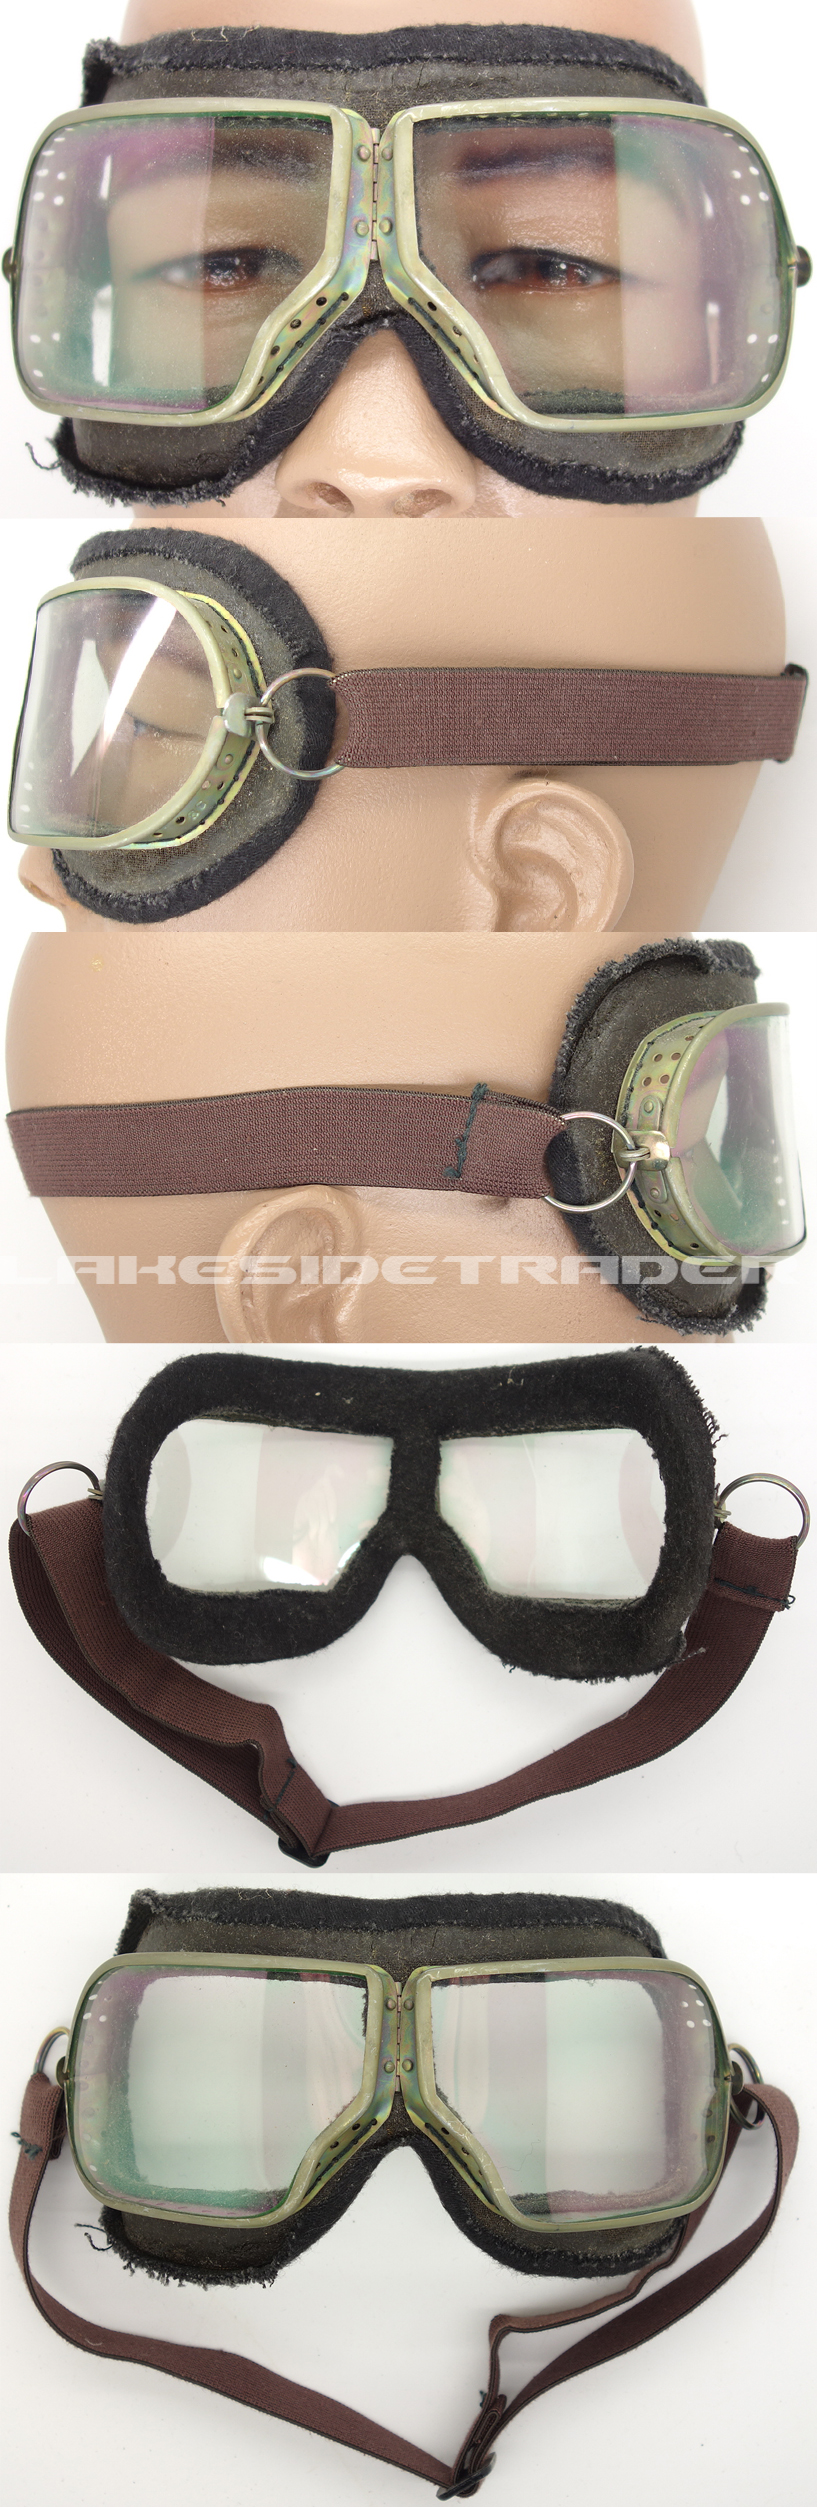 General purpose Goggles